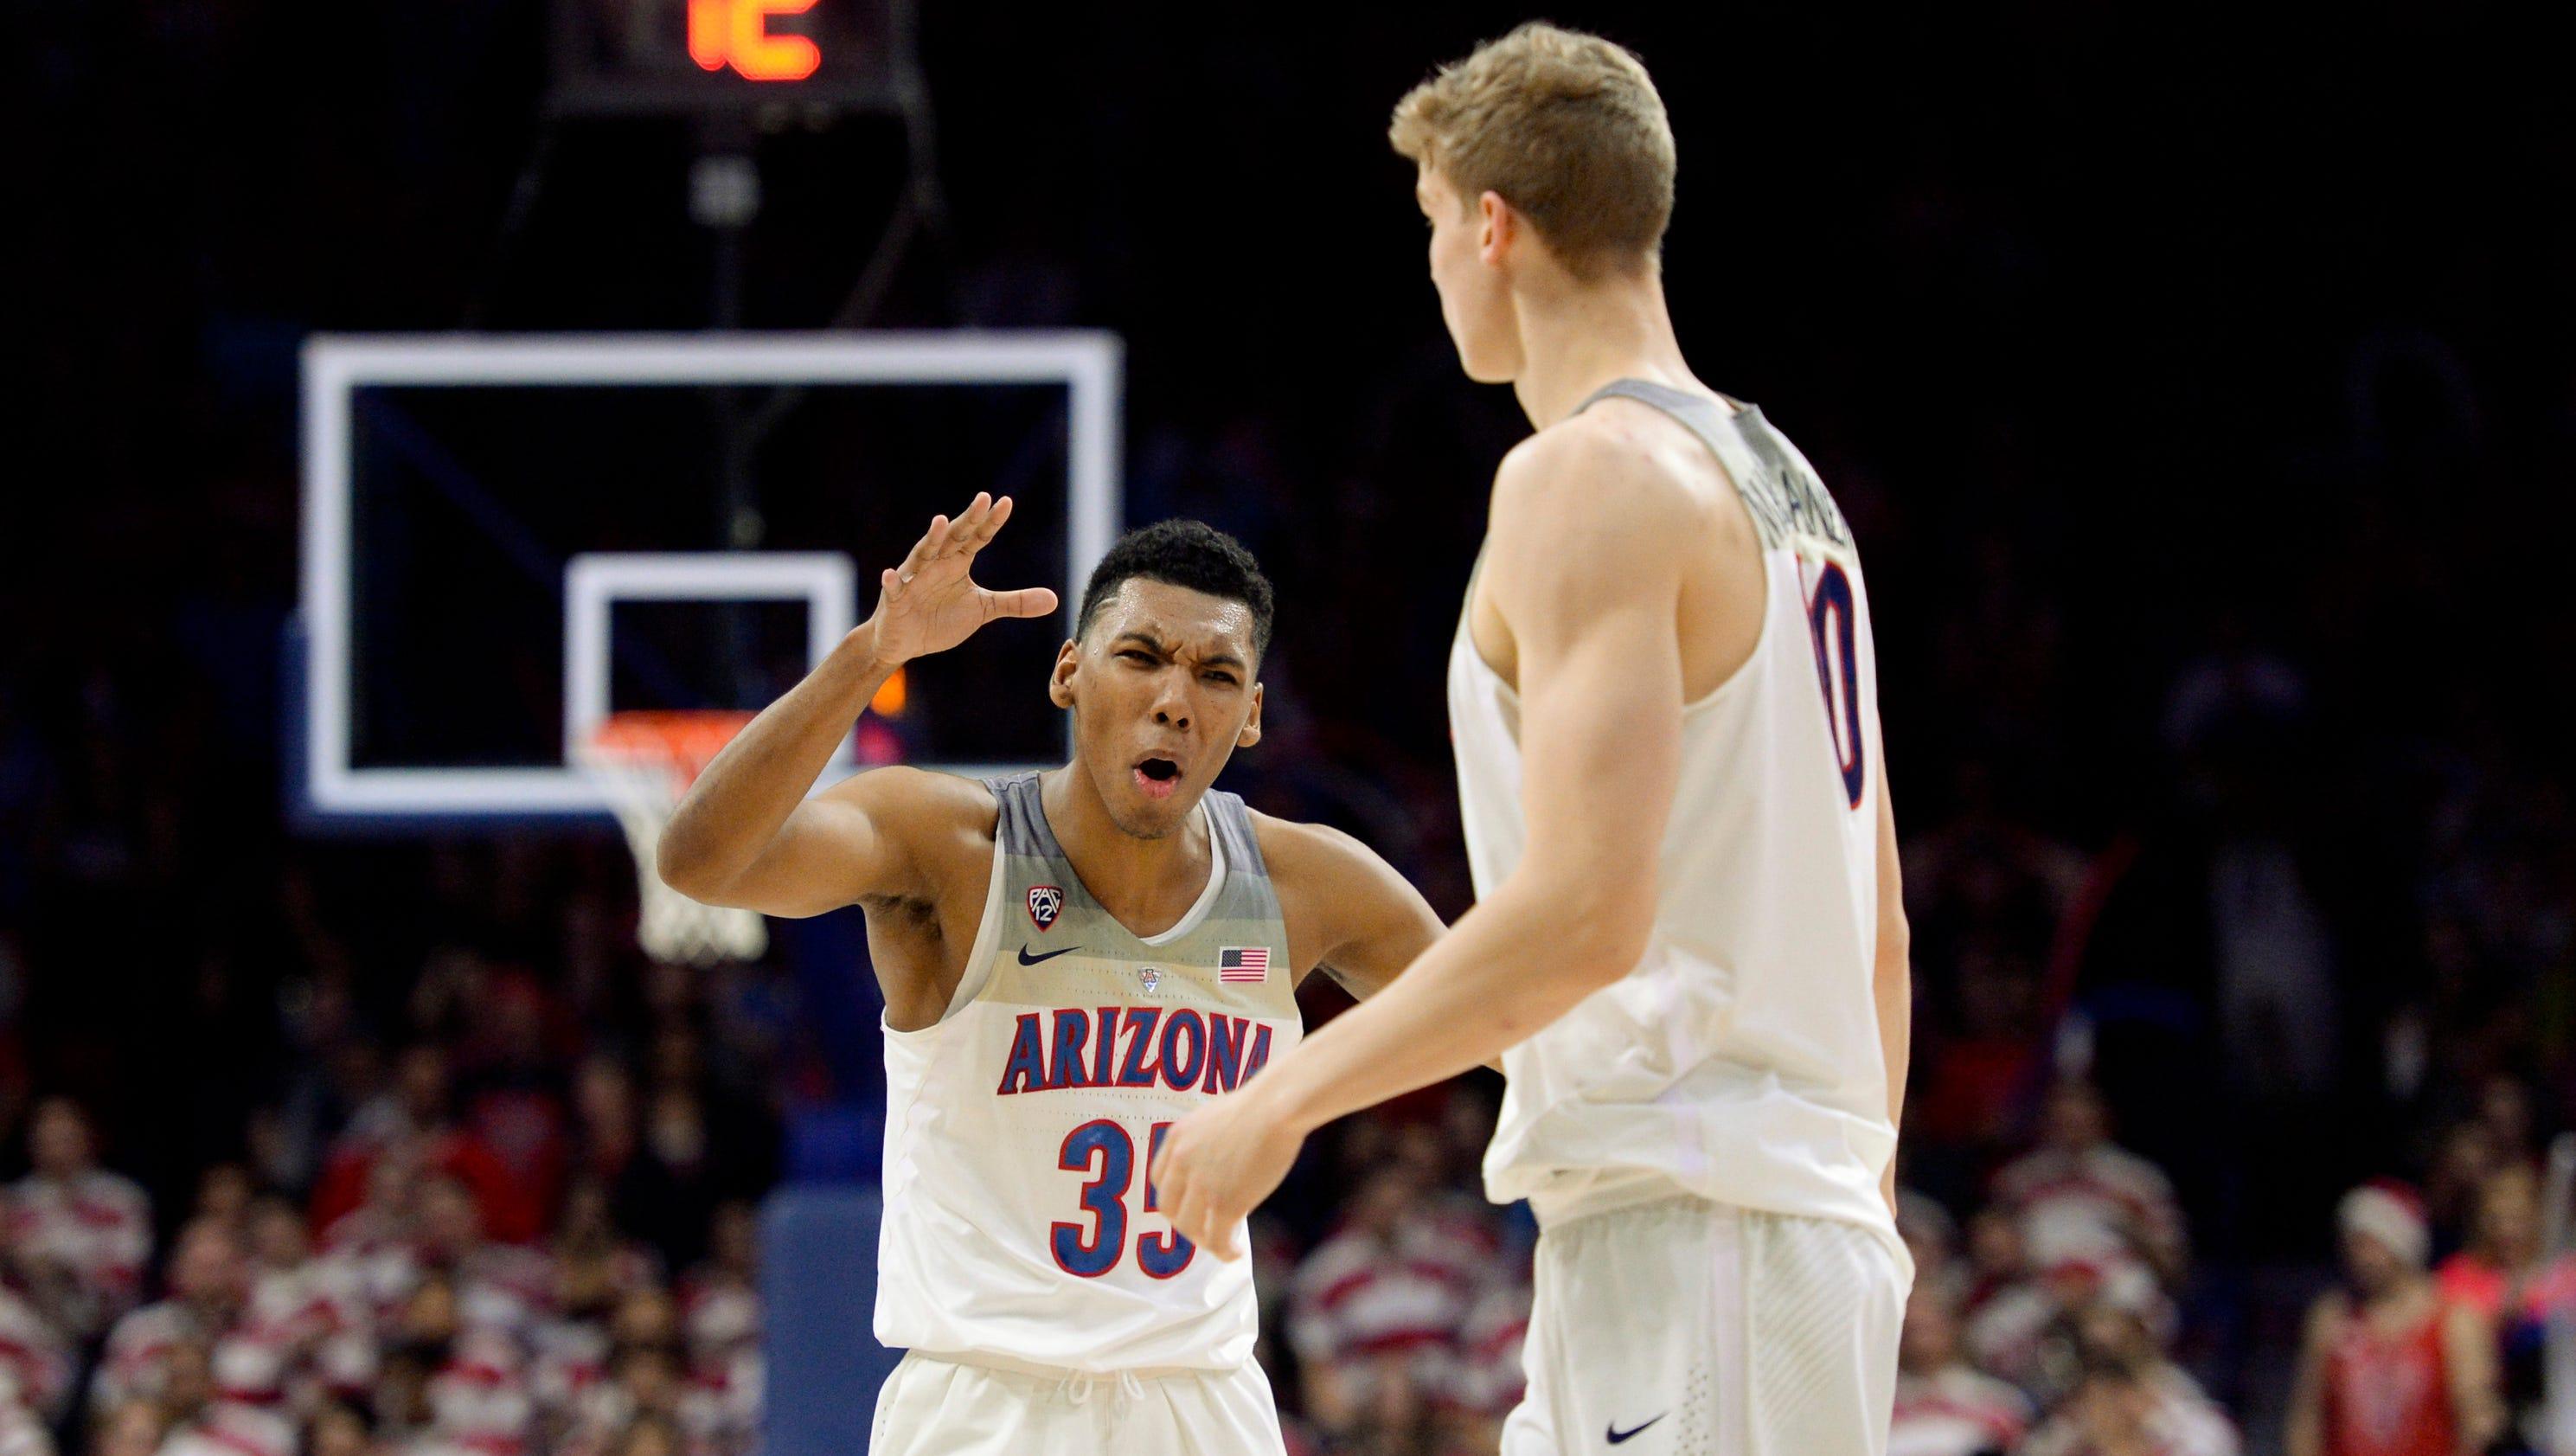 Arizona Wildcats vs. Stanford Cardinal men's basketball